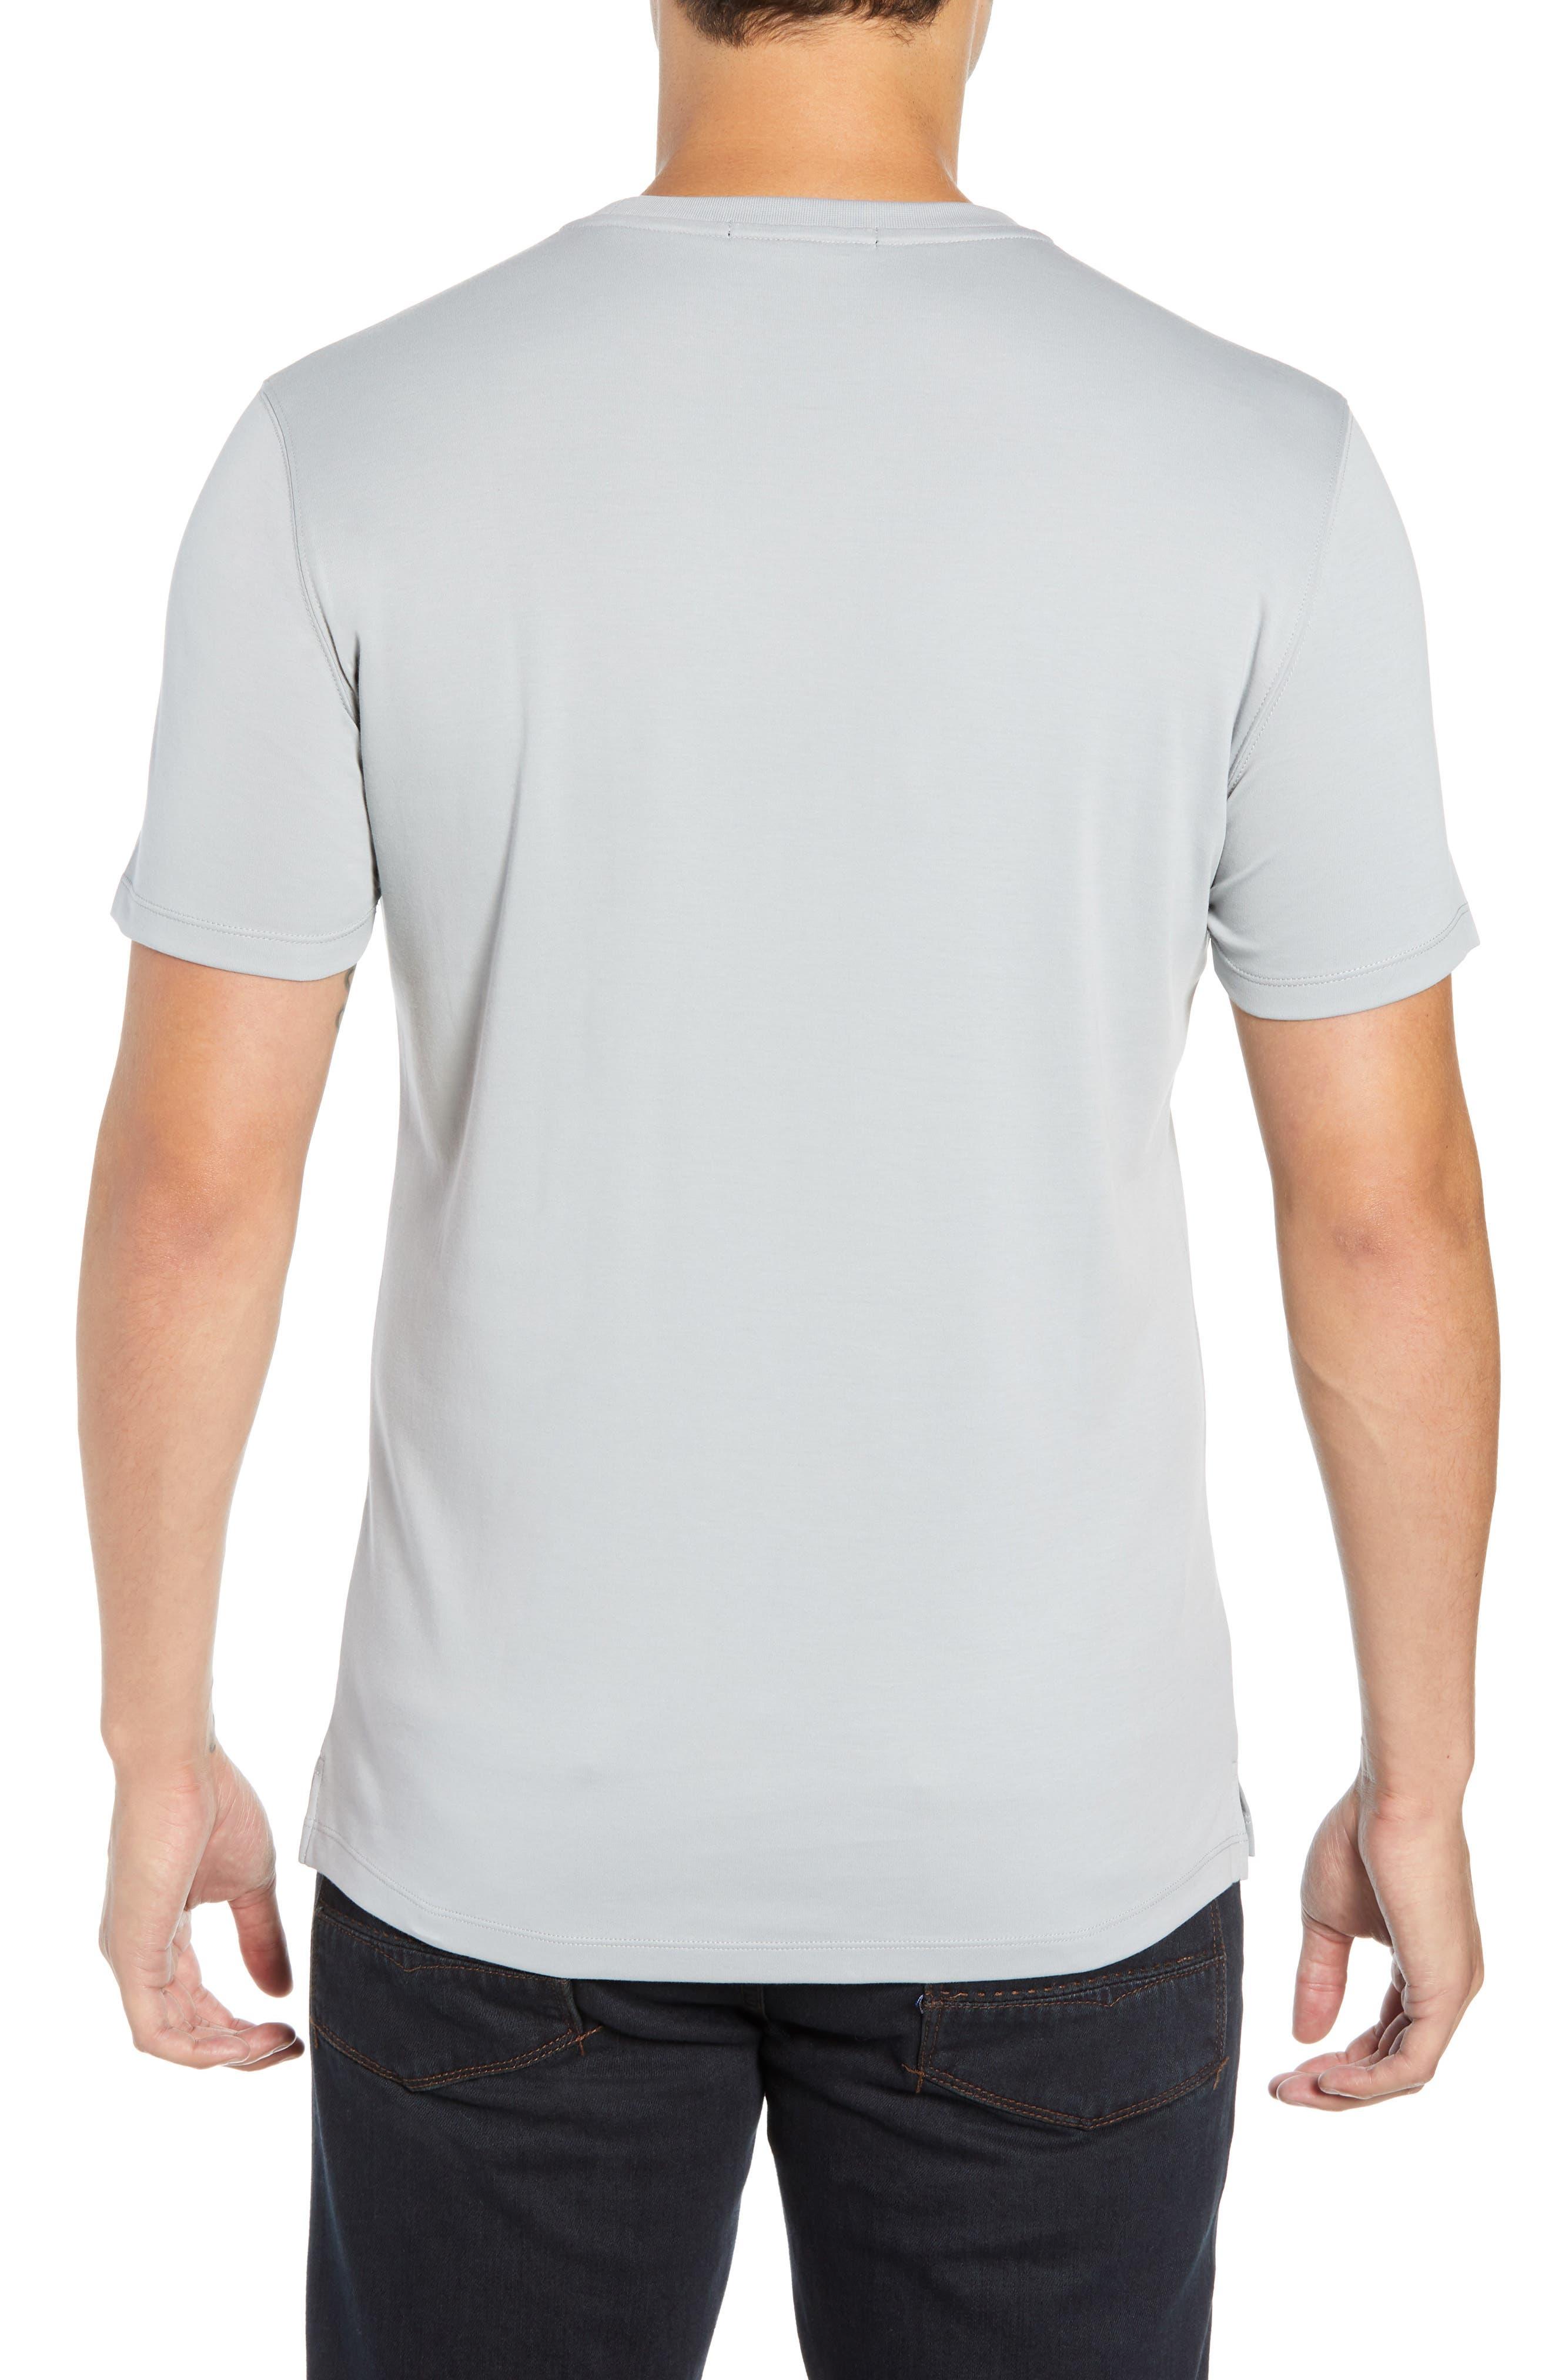 ROBERT BARAKETT,                             'Georgia' Crewneck T-Shirt,                             Alternate thumbnail 2, color,                             MOON DUST